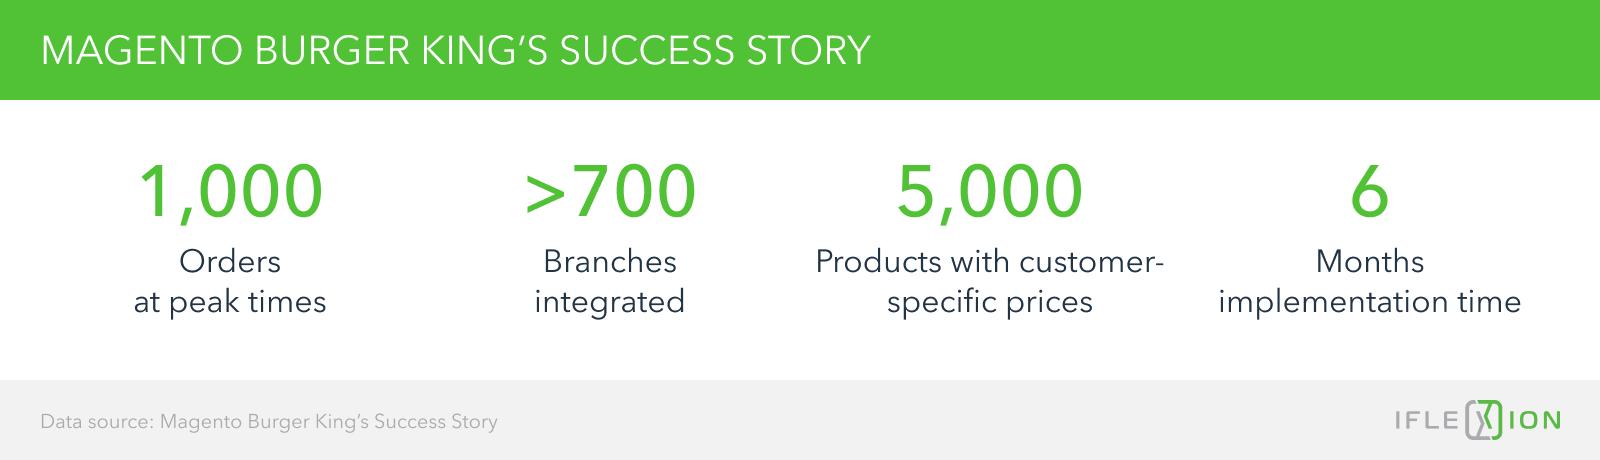 Magento Burger King's Success Story